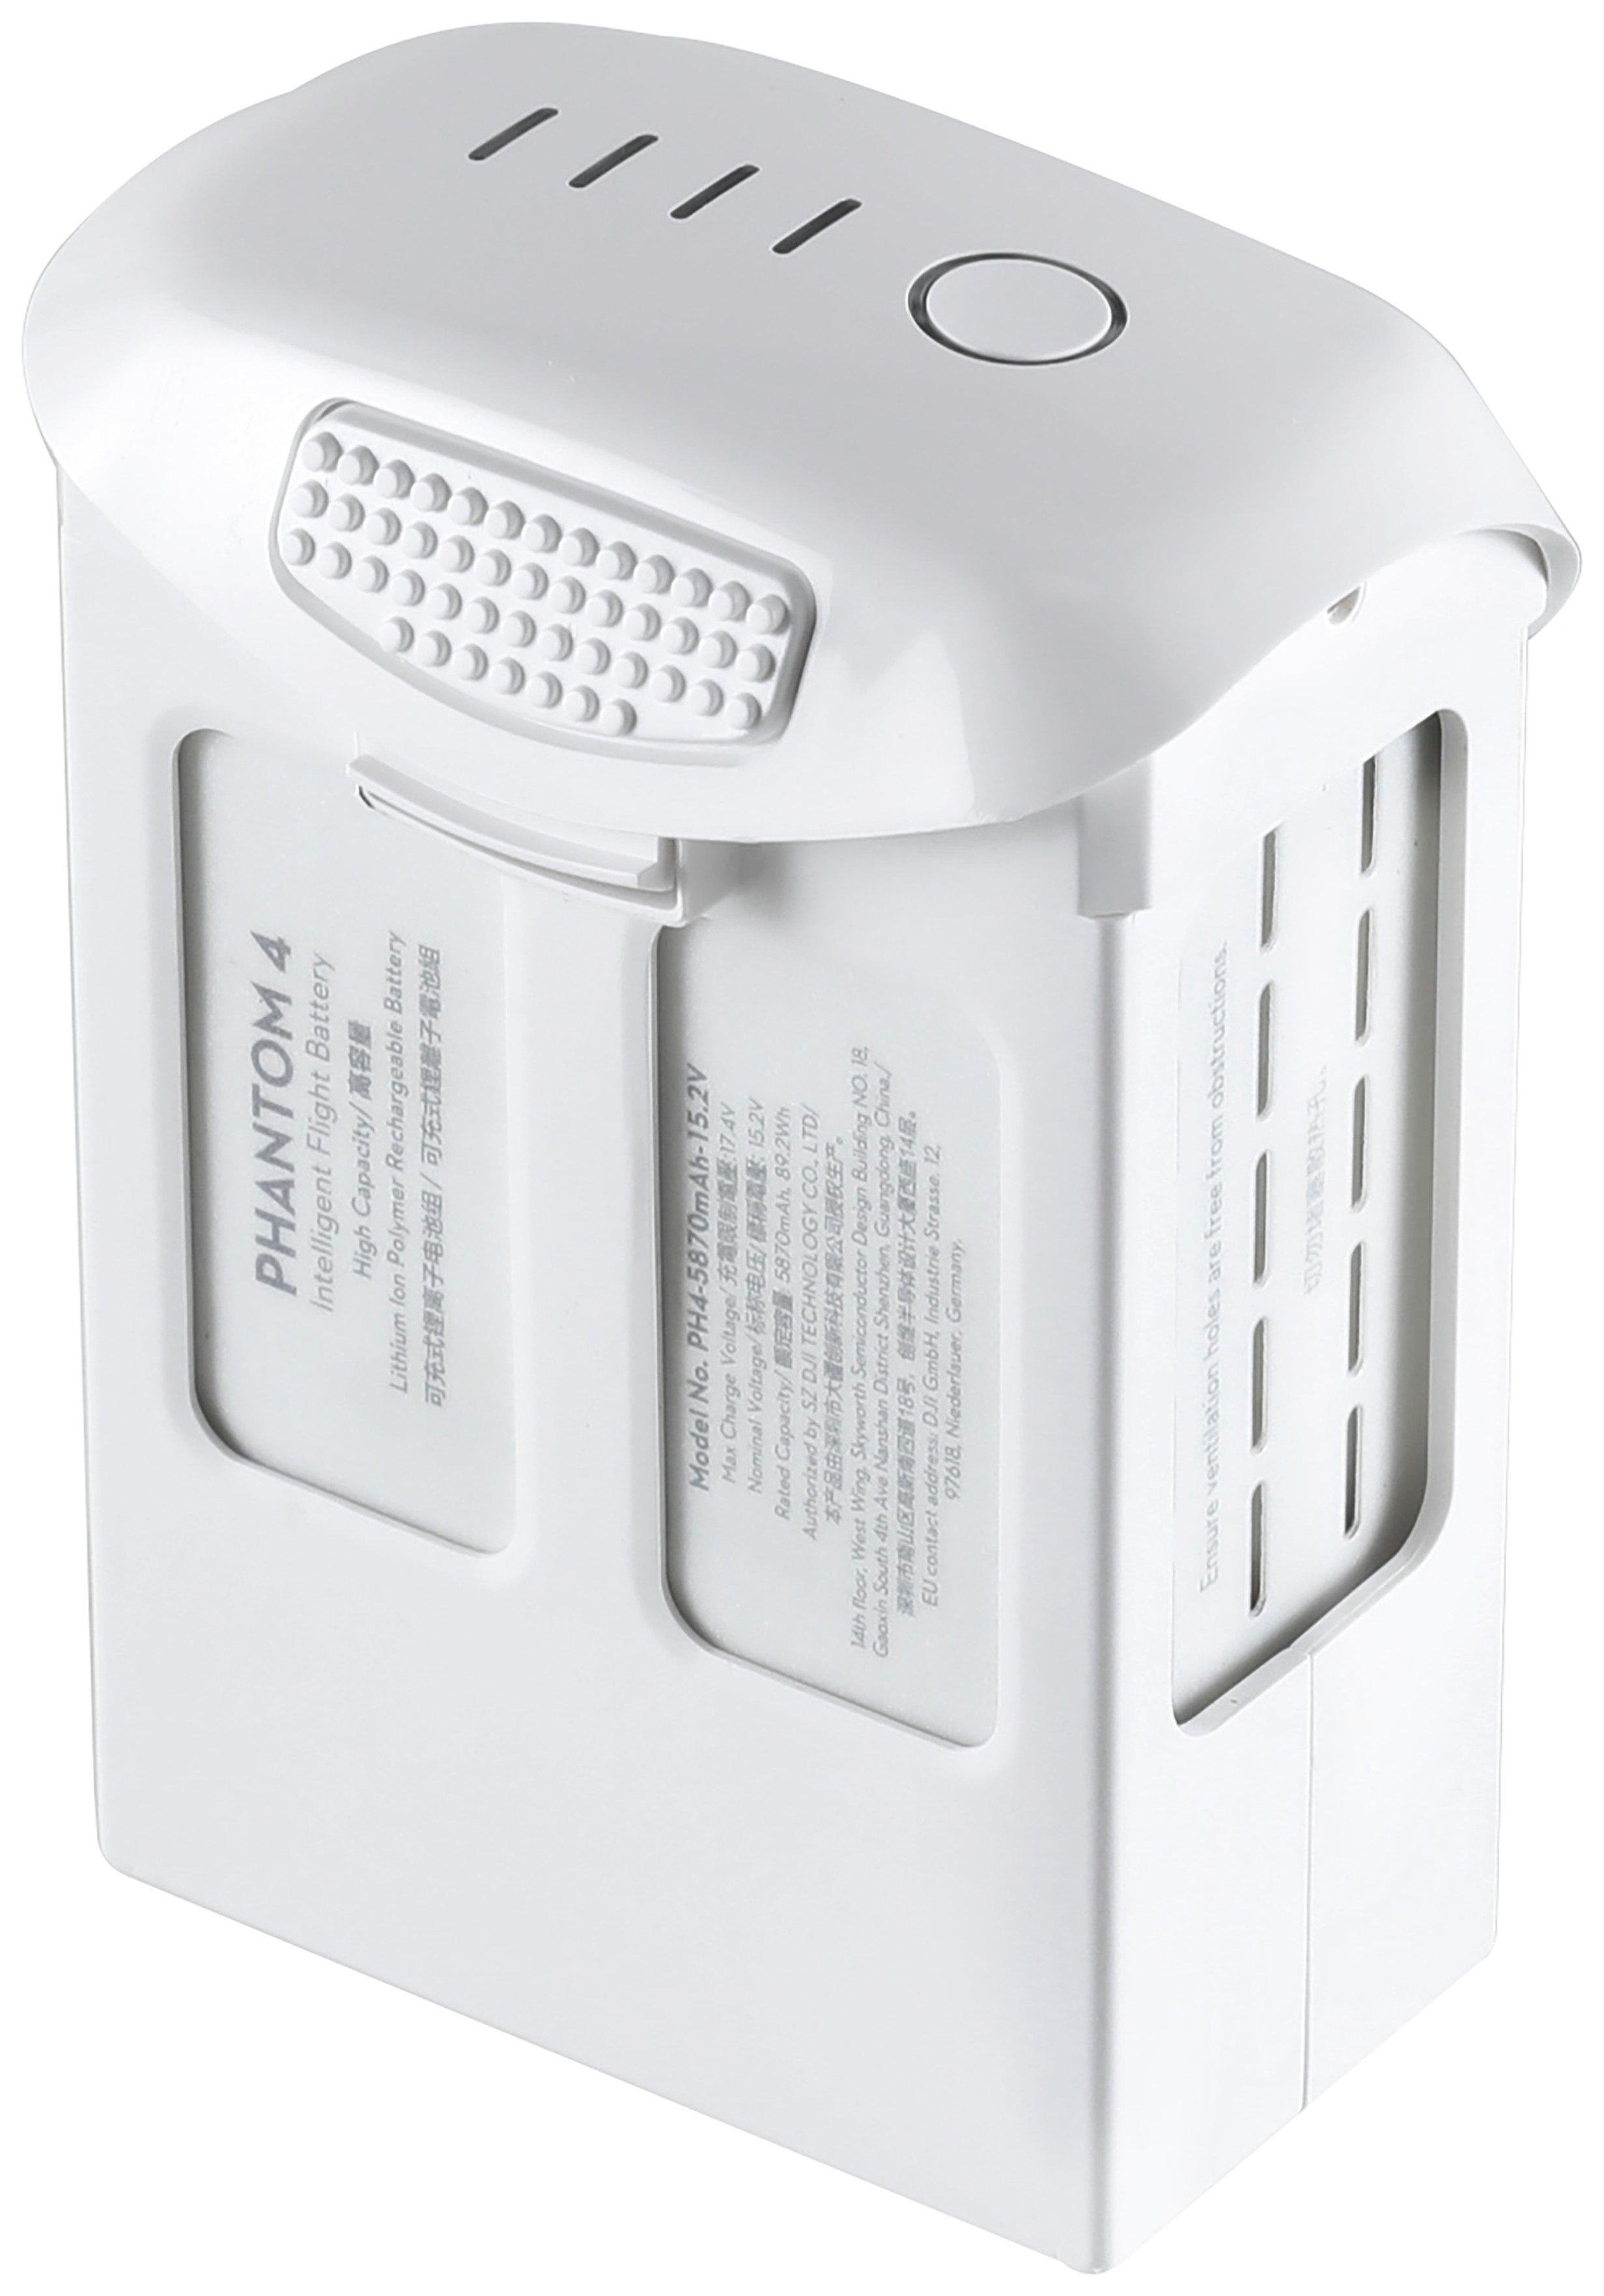 DJI Phantom 4/Pro/Pro+ Intelligent Flight  Battery